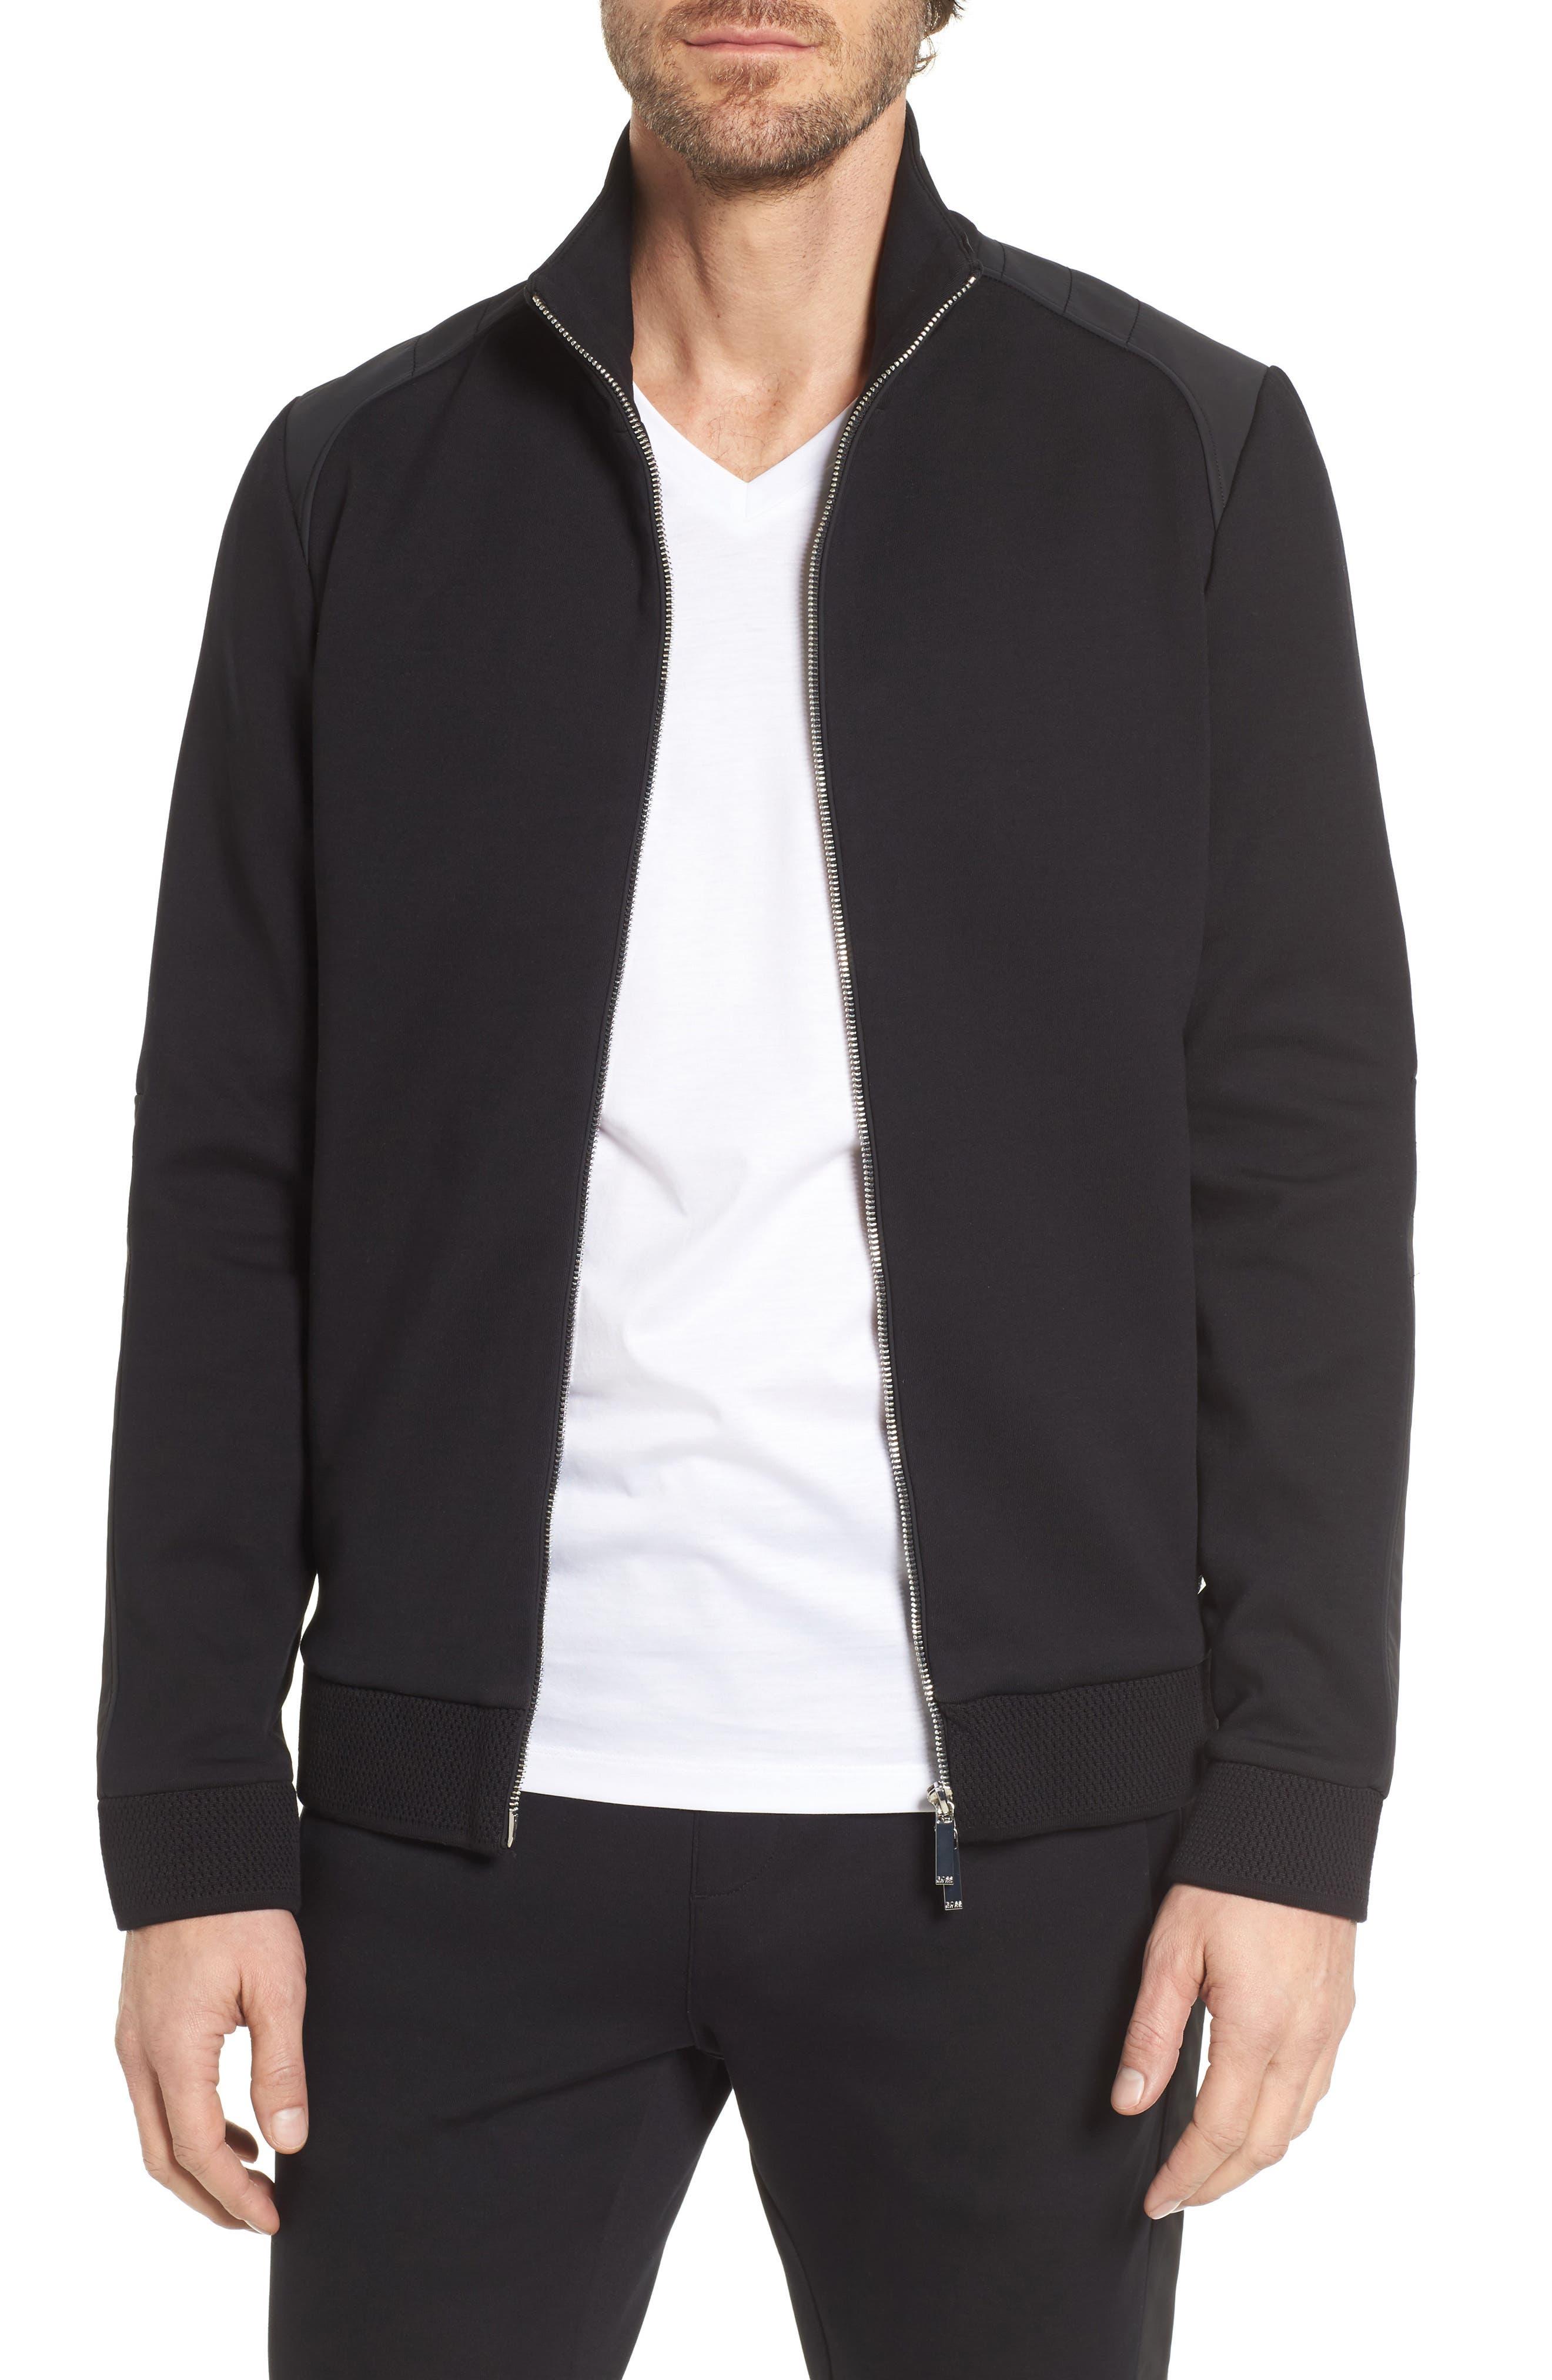 Soule Mercedes Slim Fit Zip Jacket,                         Main,                         color, Black